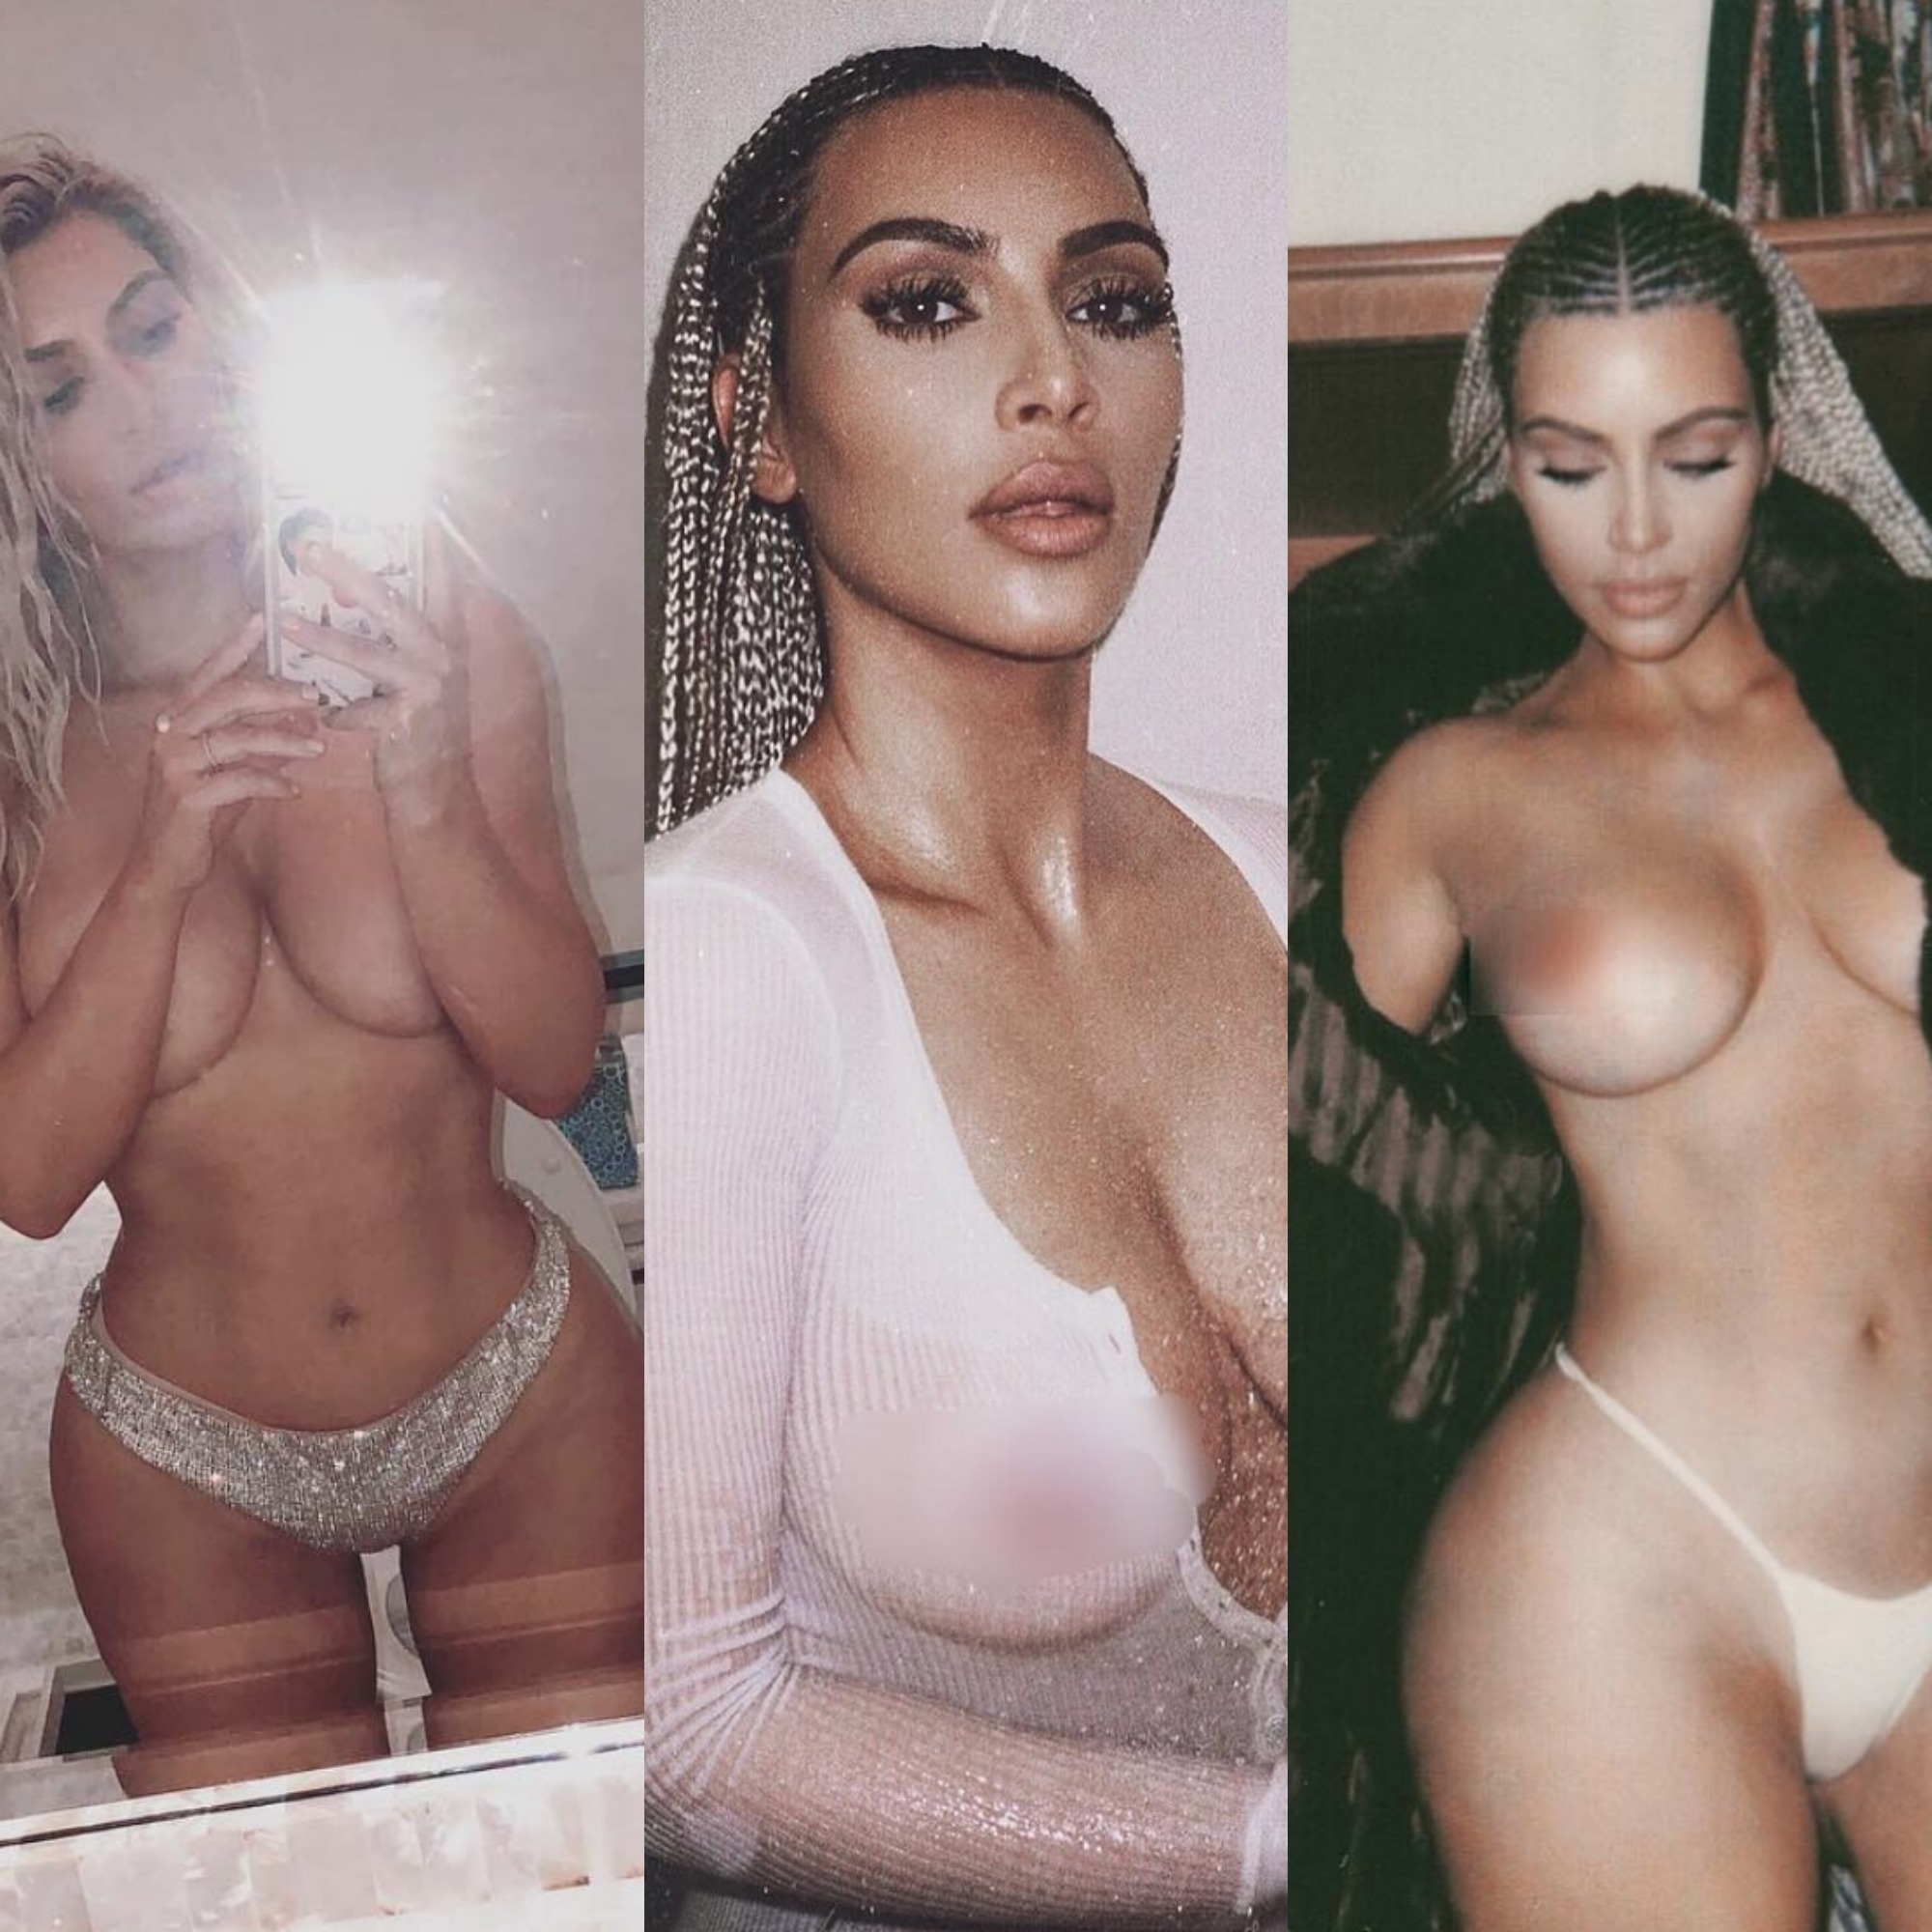 Nude kim kardashian photo leak